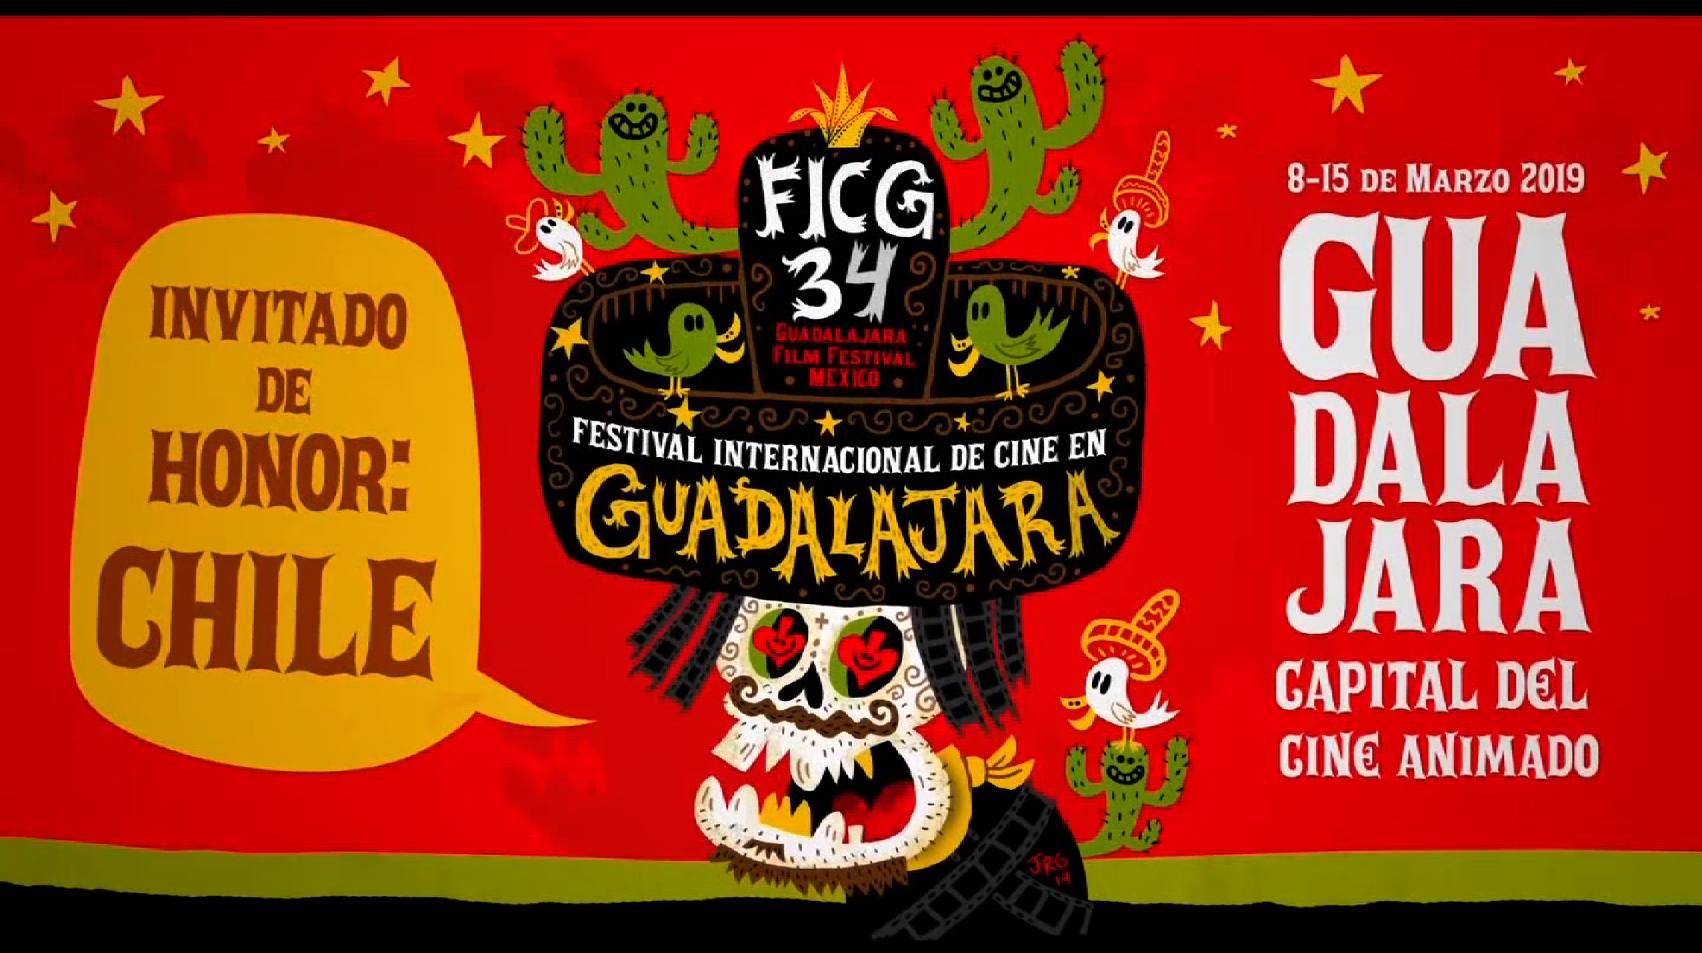 Festival Internacional de Cine en Guadalajara, una ventana al cine iberoamericano